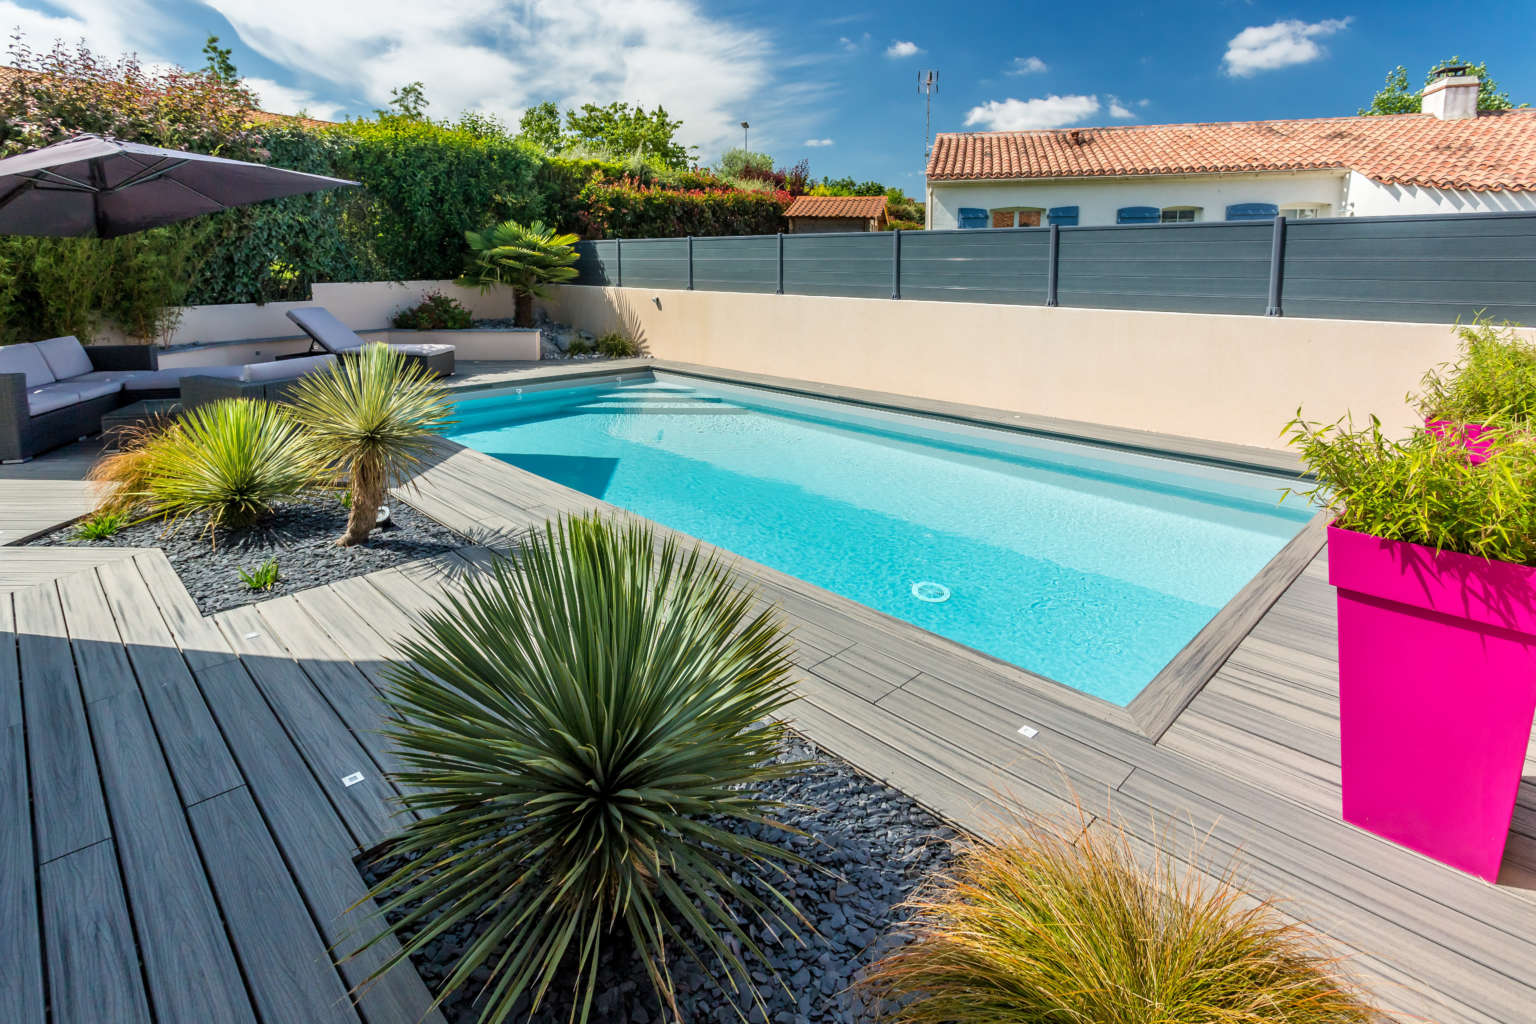 Imersion piscines Vendée